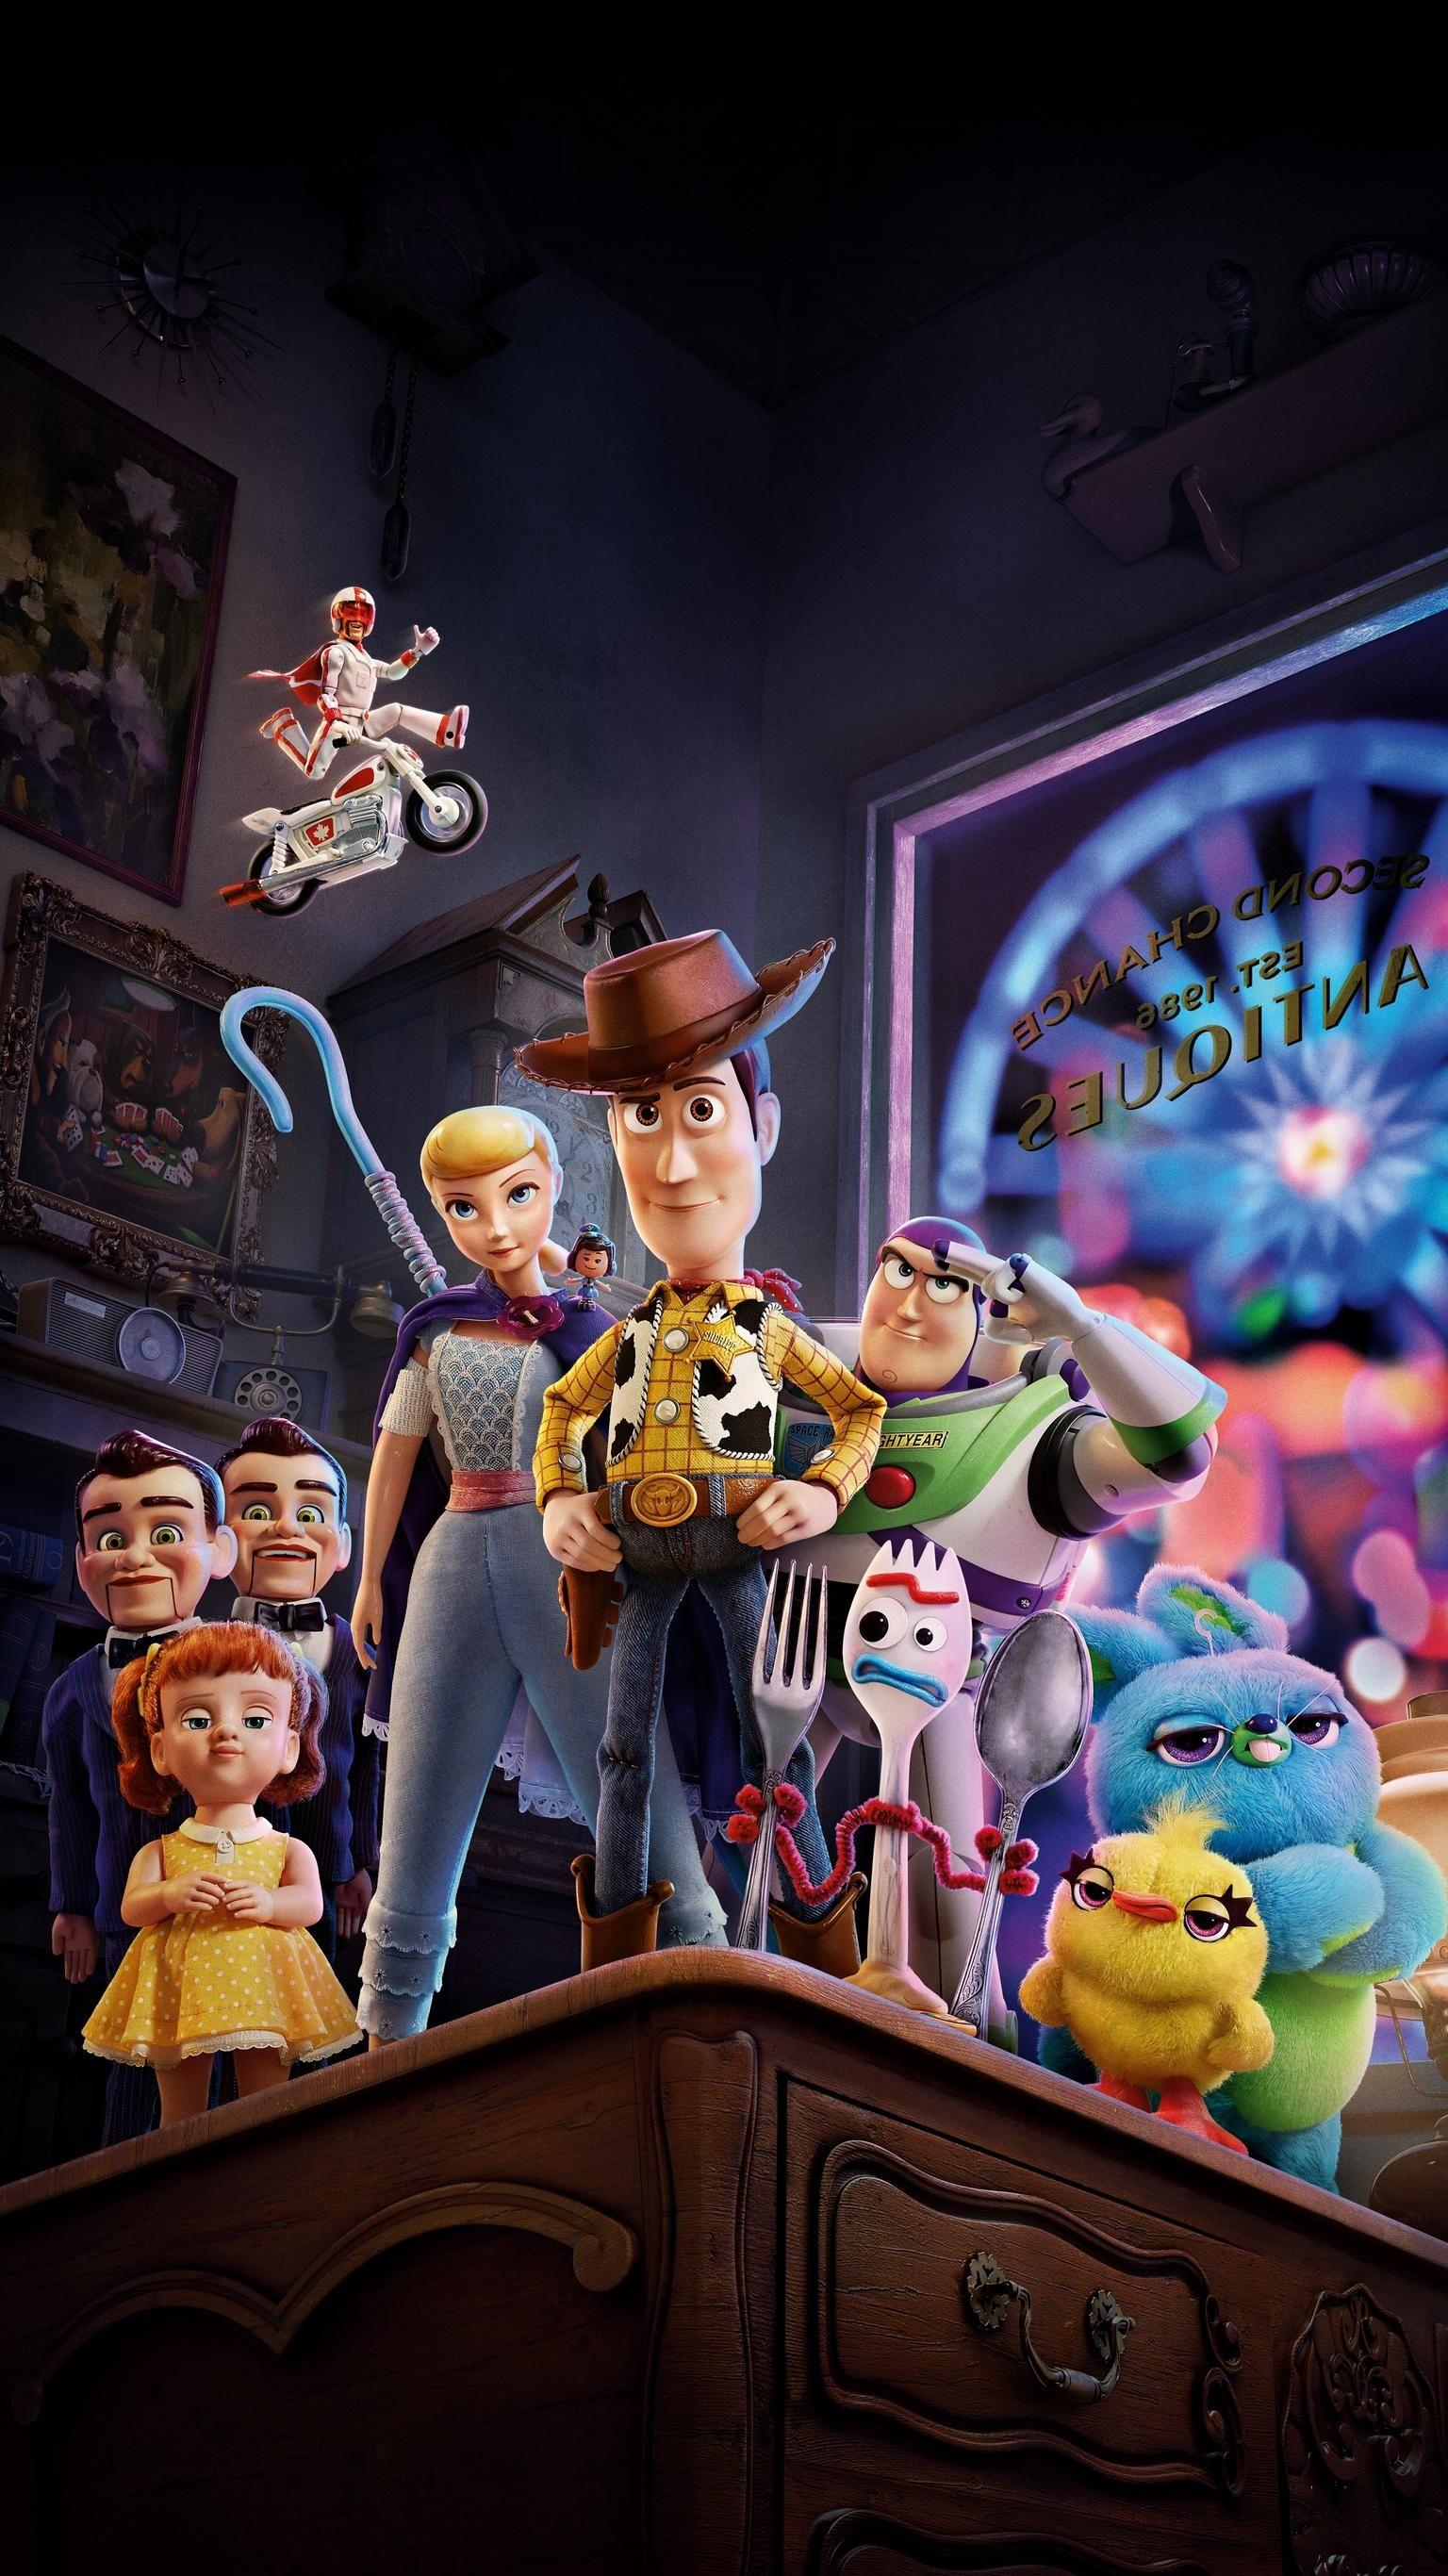 Toy Story 4 (2019) Phone Wallpaper | Moviemania | Disney ...